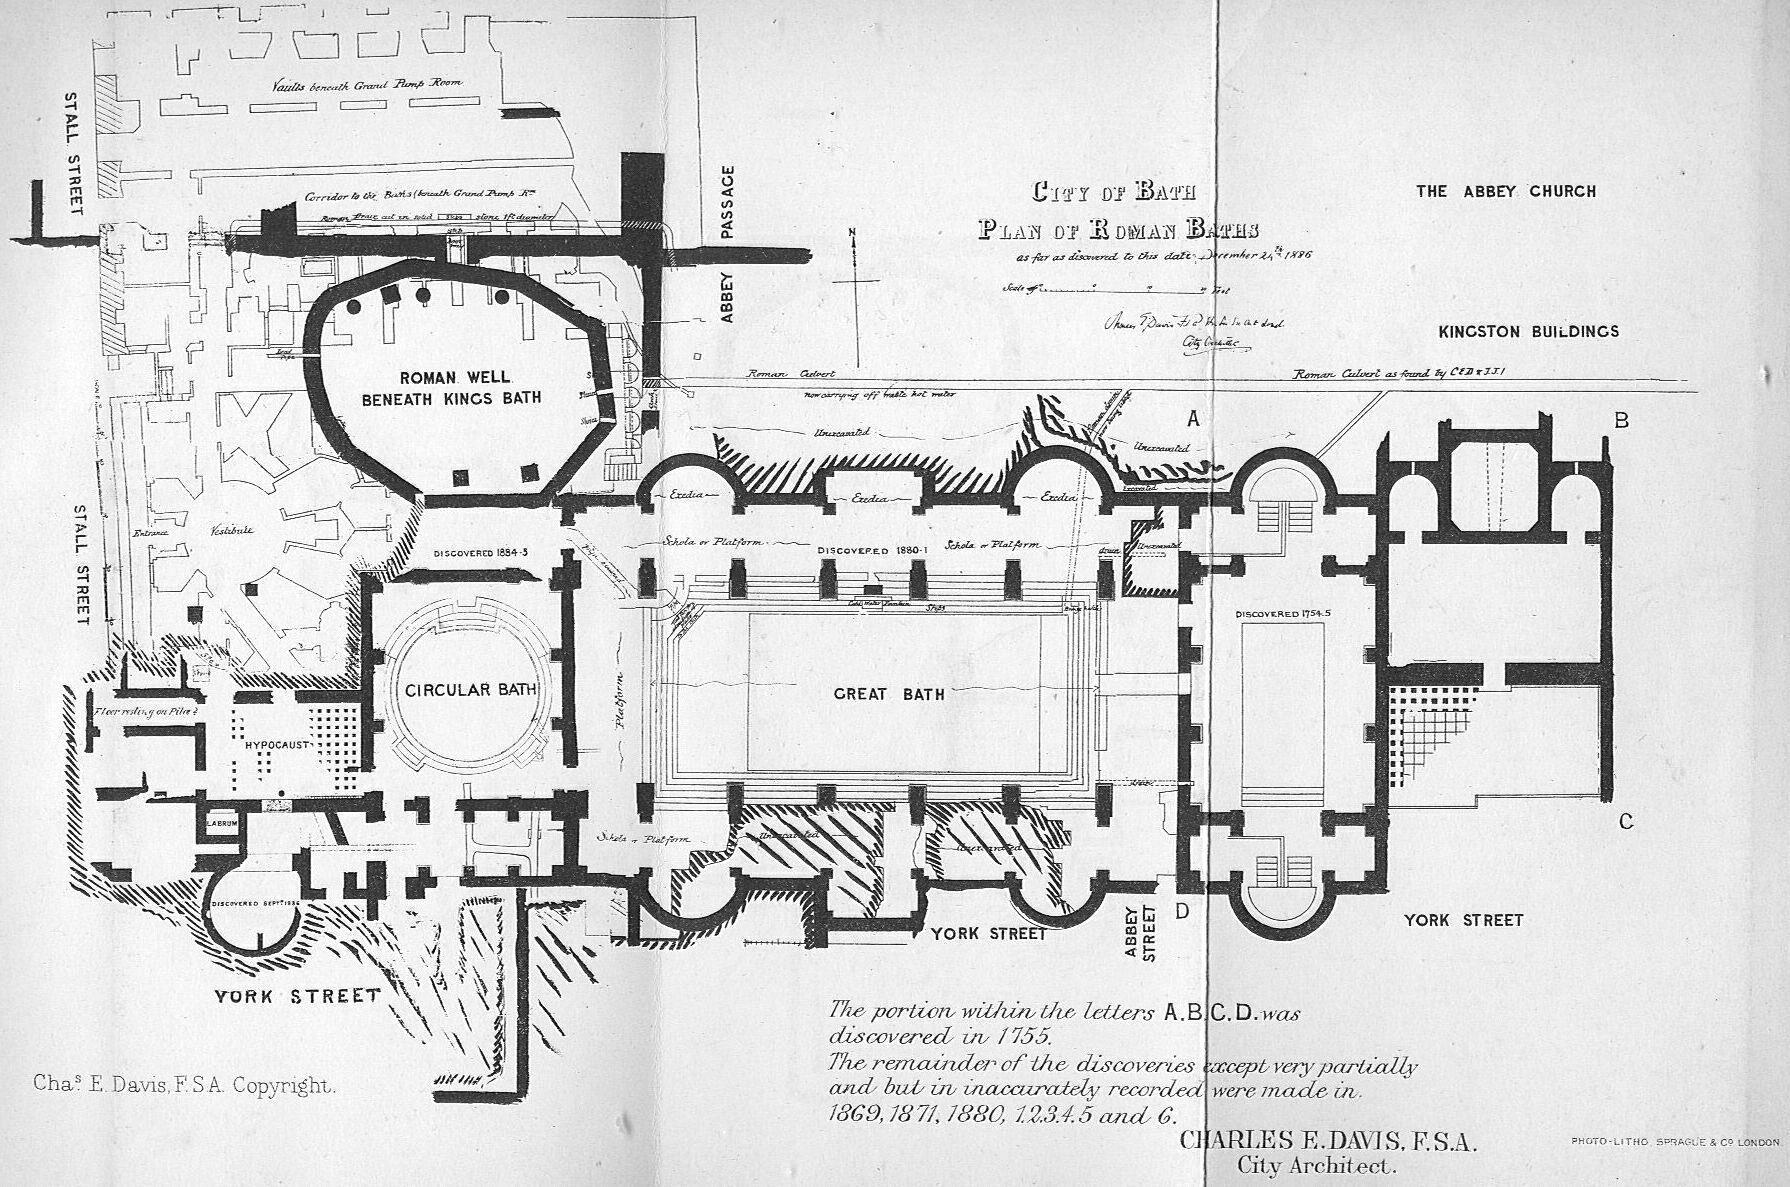 medium resolution of bedroom house floor plans ancient roman bath house floor plan from roman bath house floor plan image source futurehorizons us